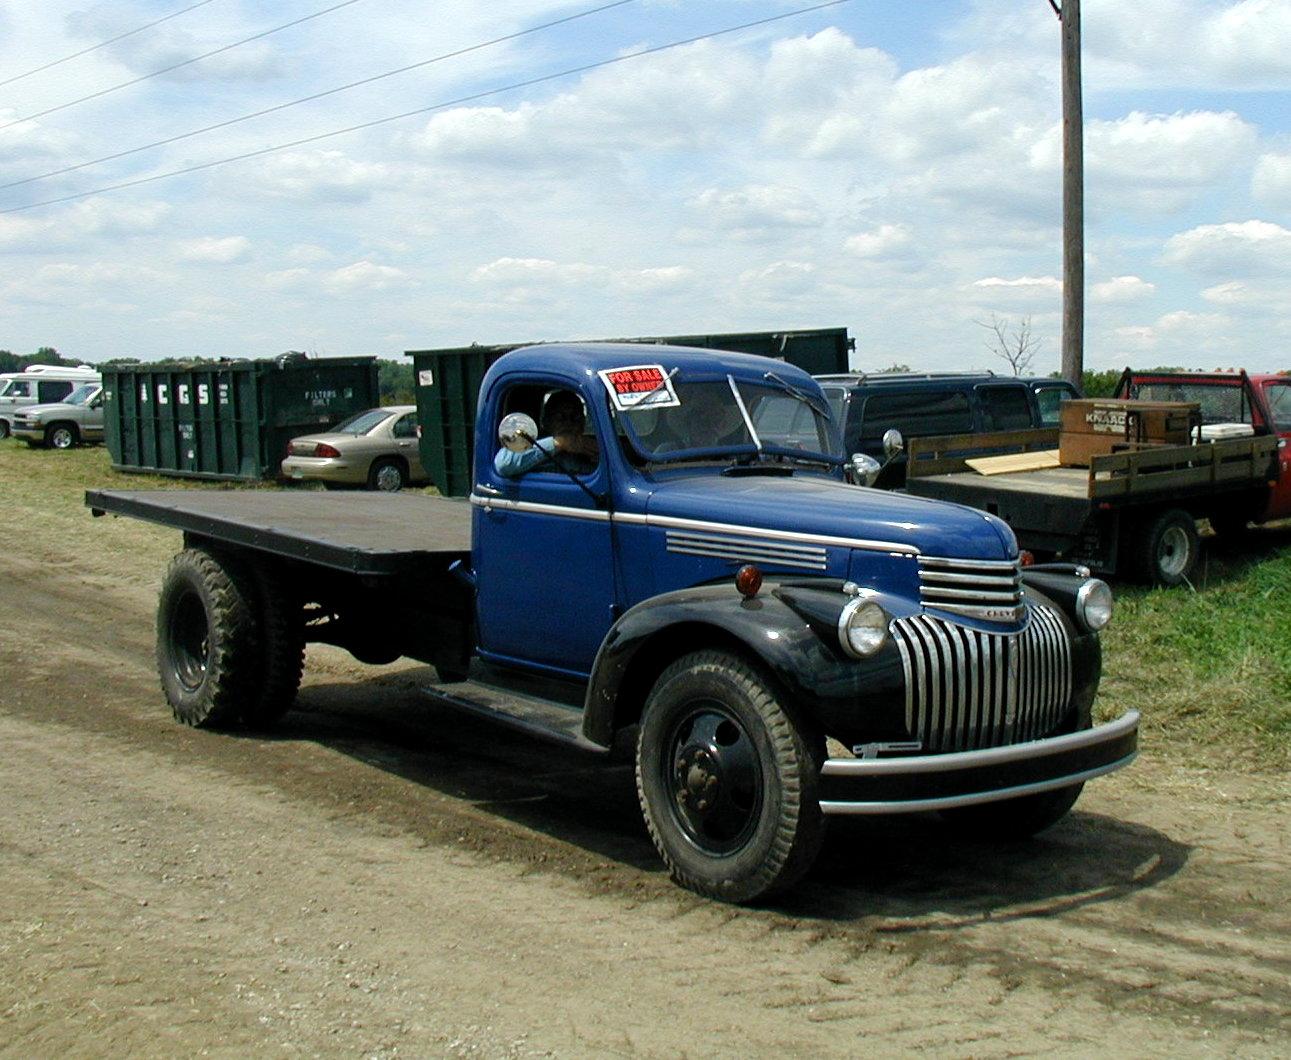 Old Chevy Truck Wallpaper - WallpaperSafari